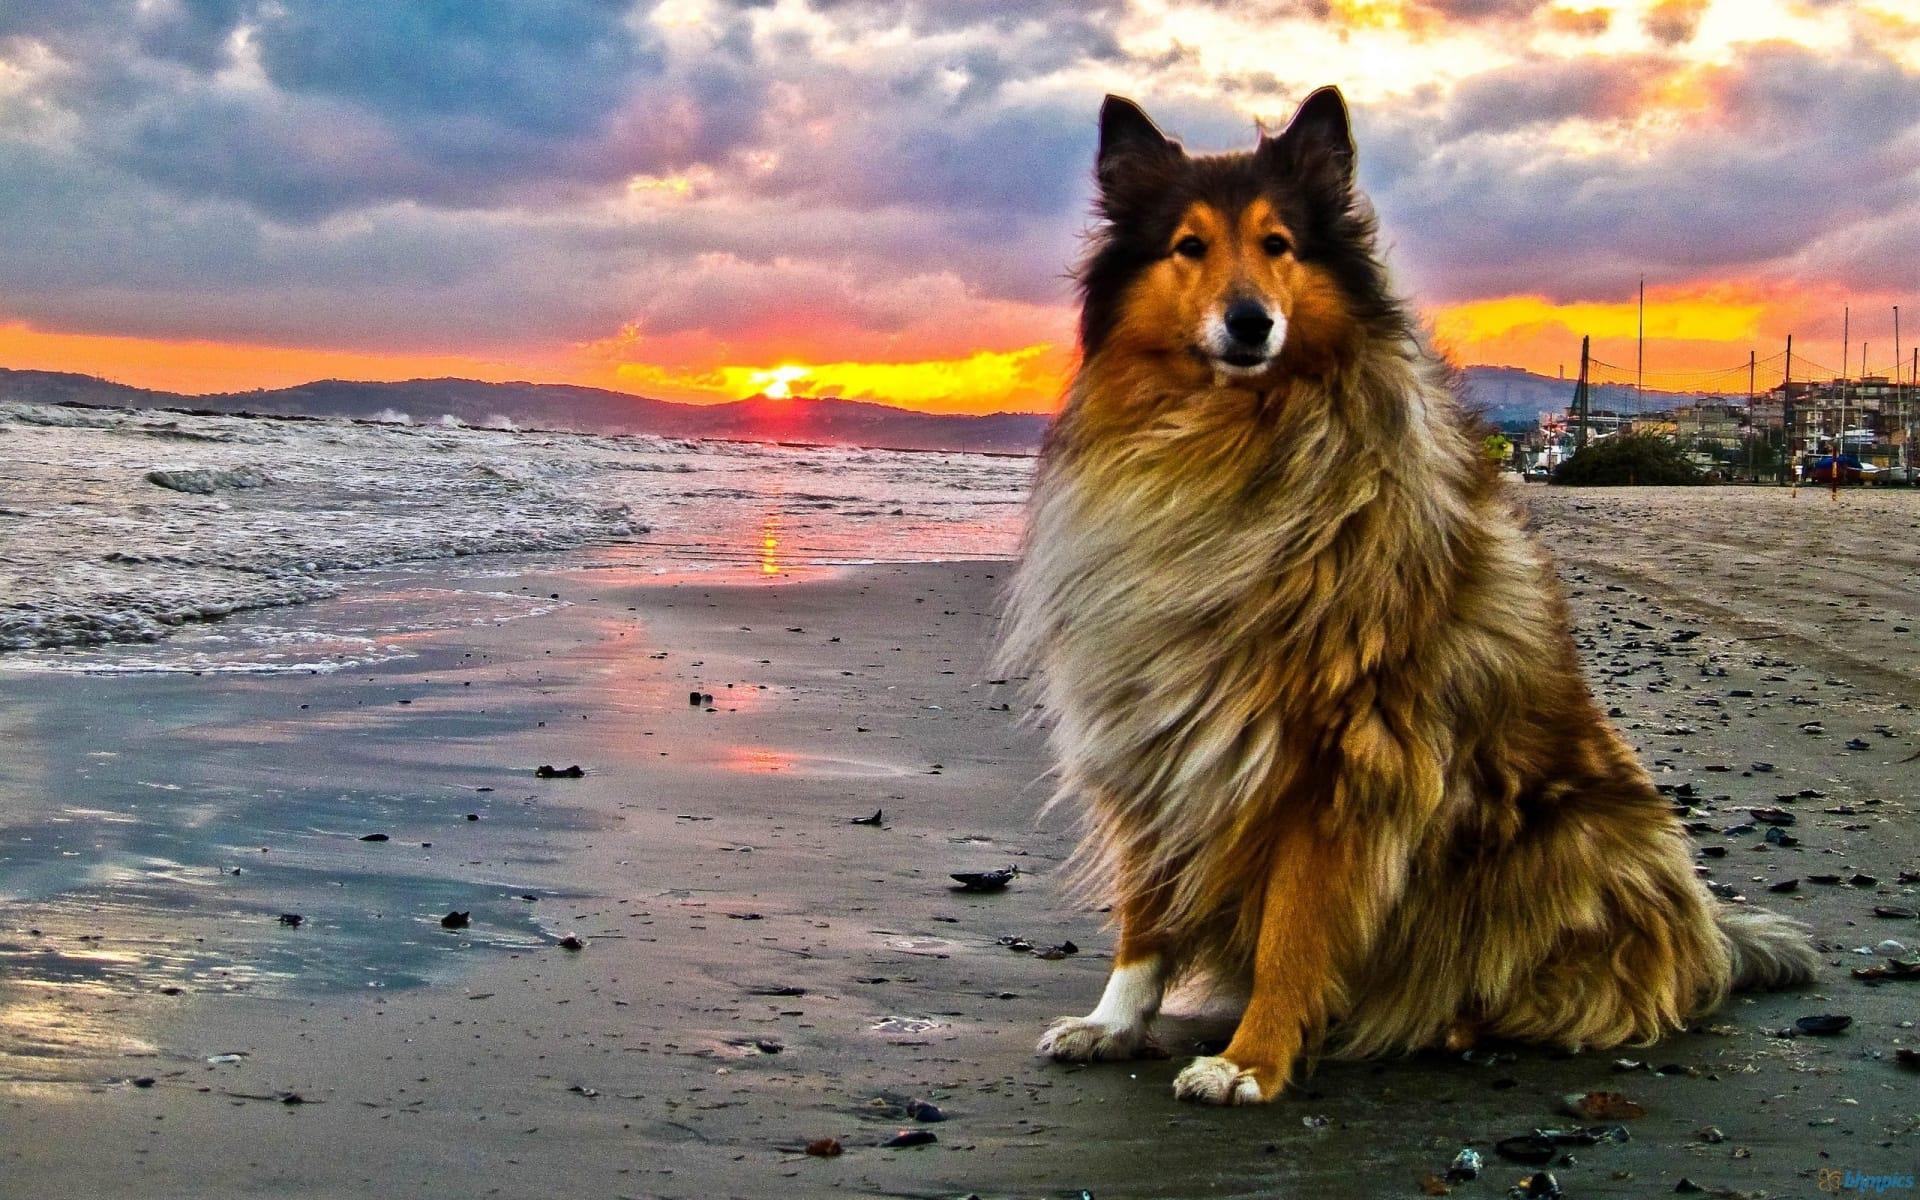 herding-dog-on-beach-at-sunset-232308